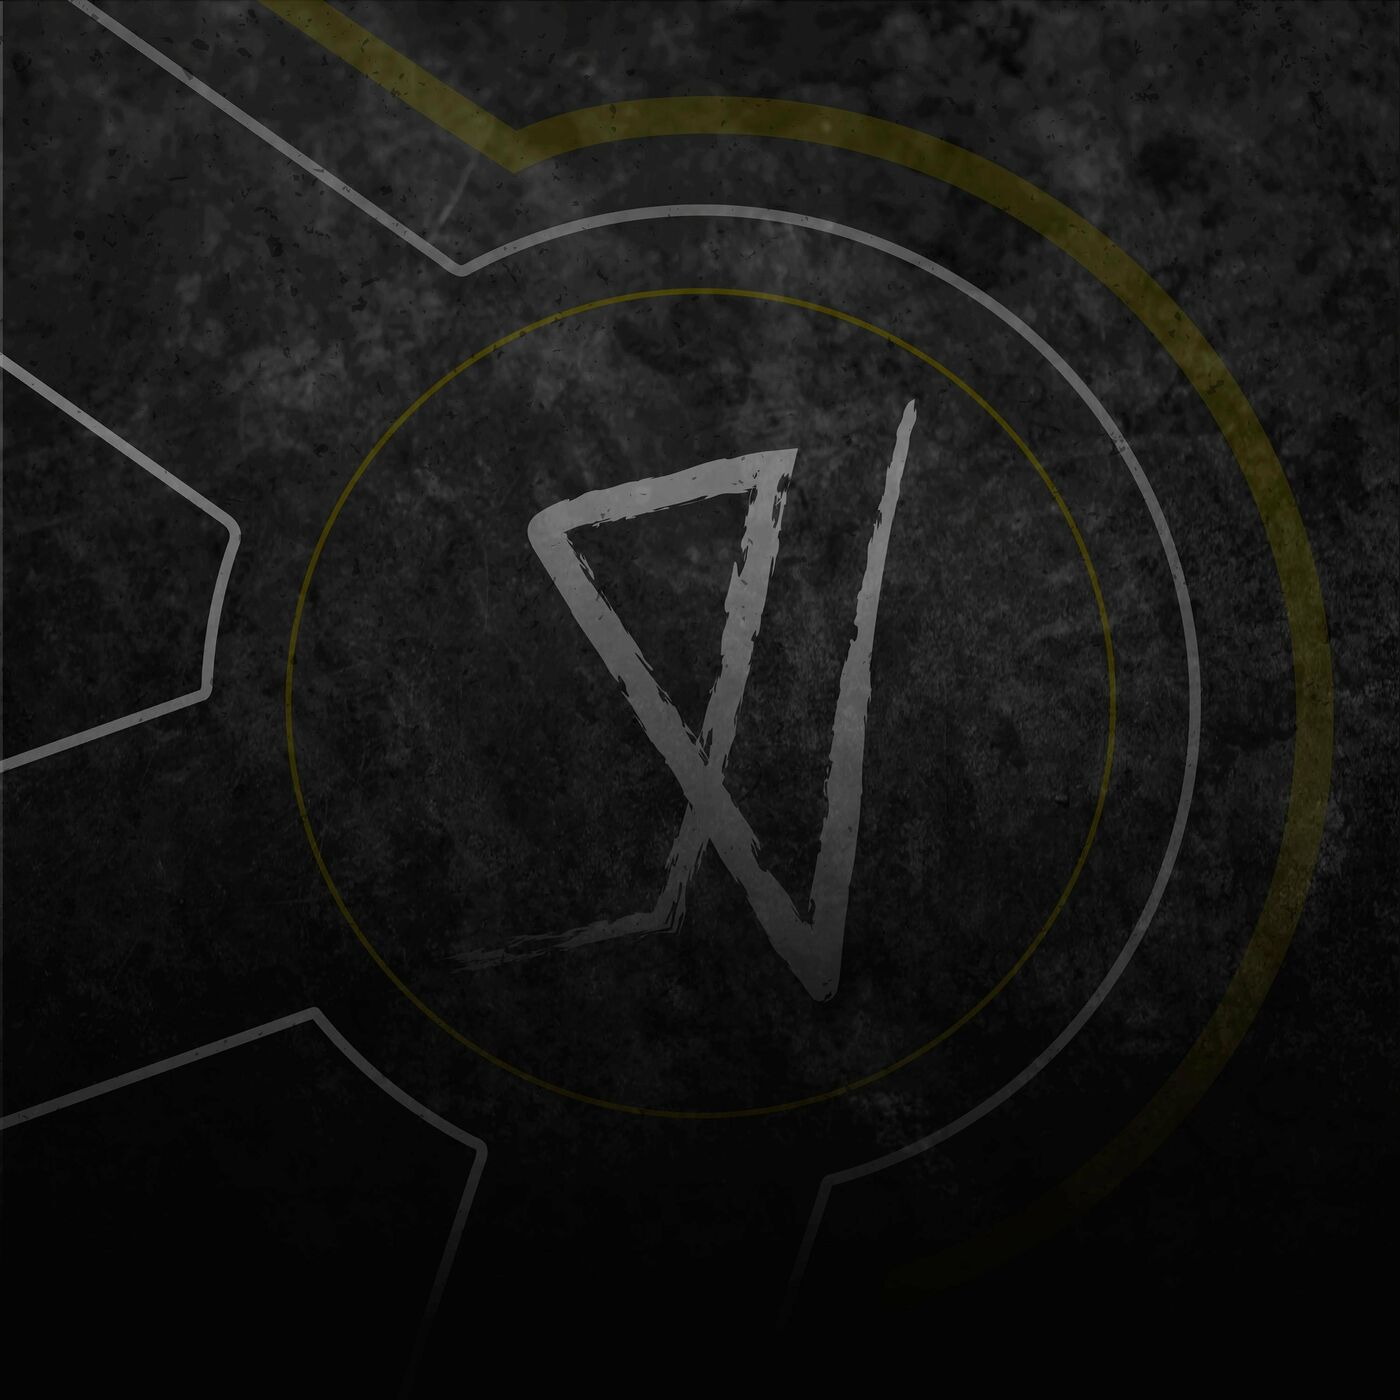 Afterglow - Burning [single] (2021)